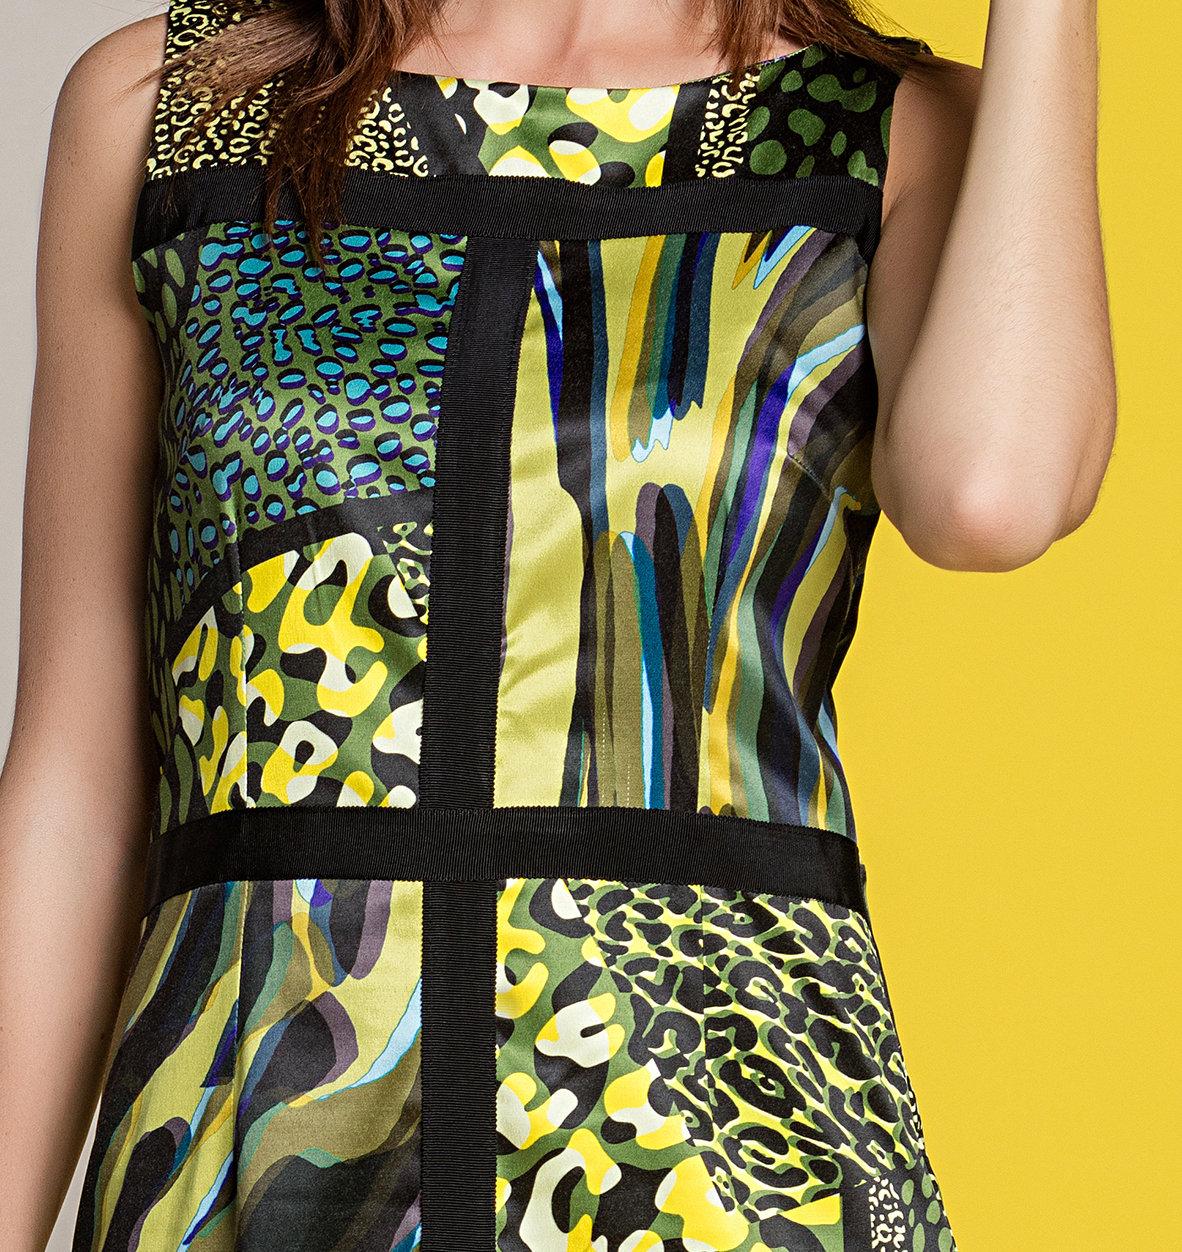 Paul Brial: Olive Martini Colorblock Sundress (1 Left!)